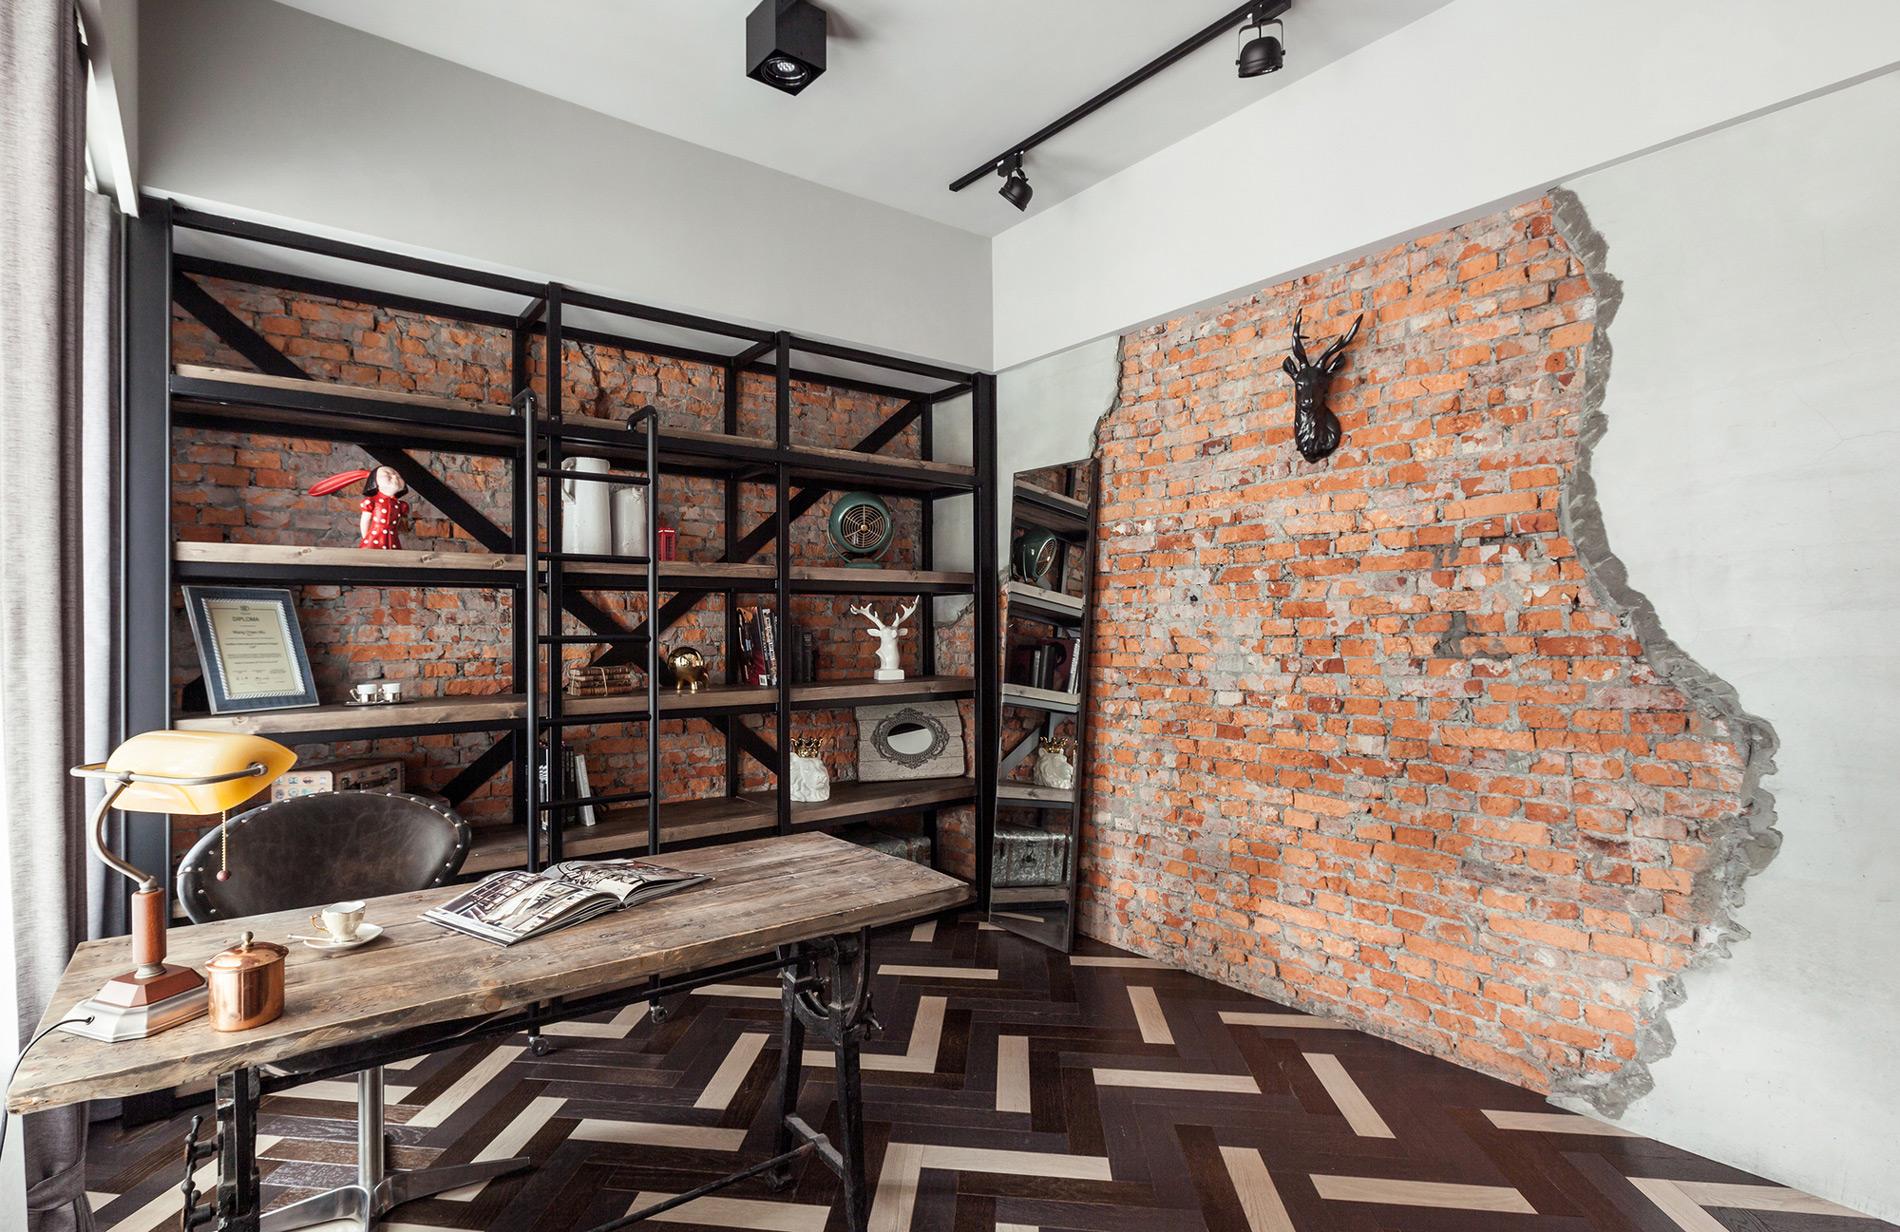 Apartment Refurbishment / CHI-TORCH Interior Design (14)